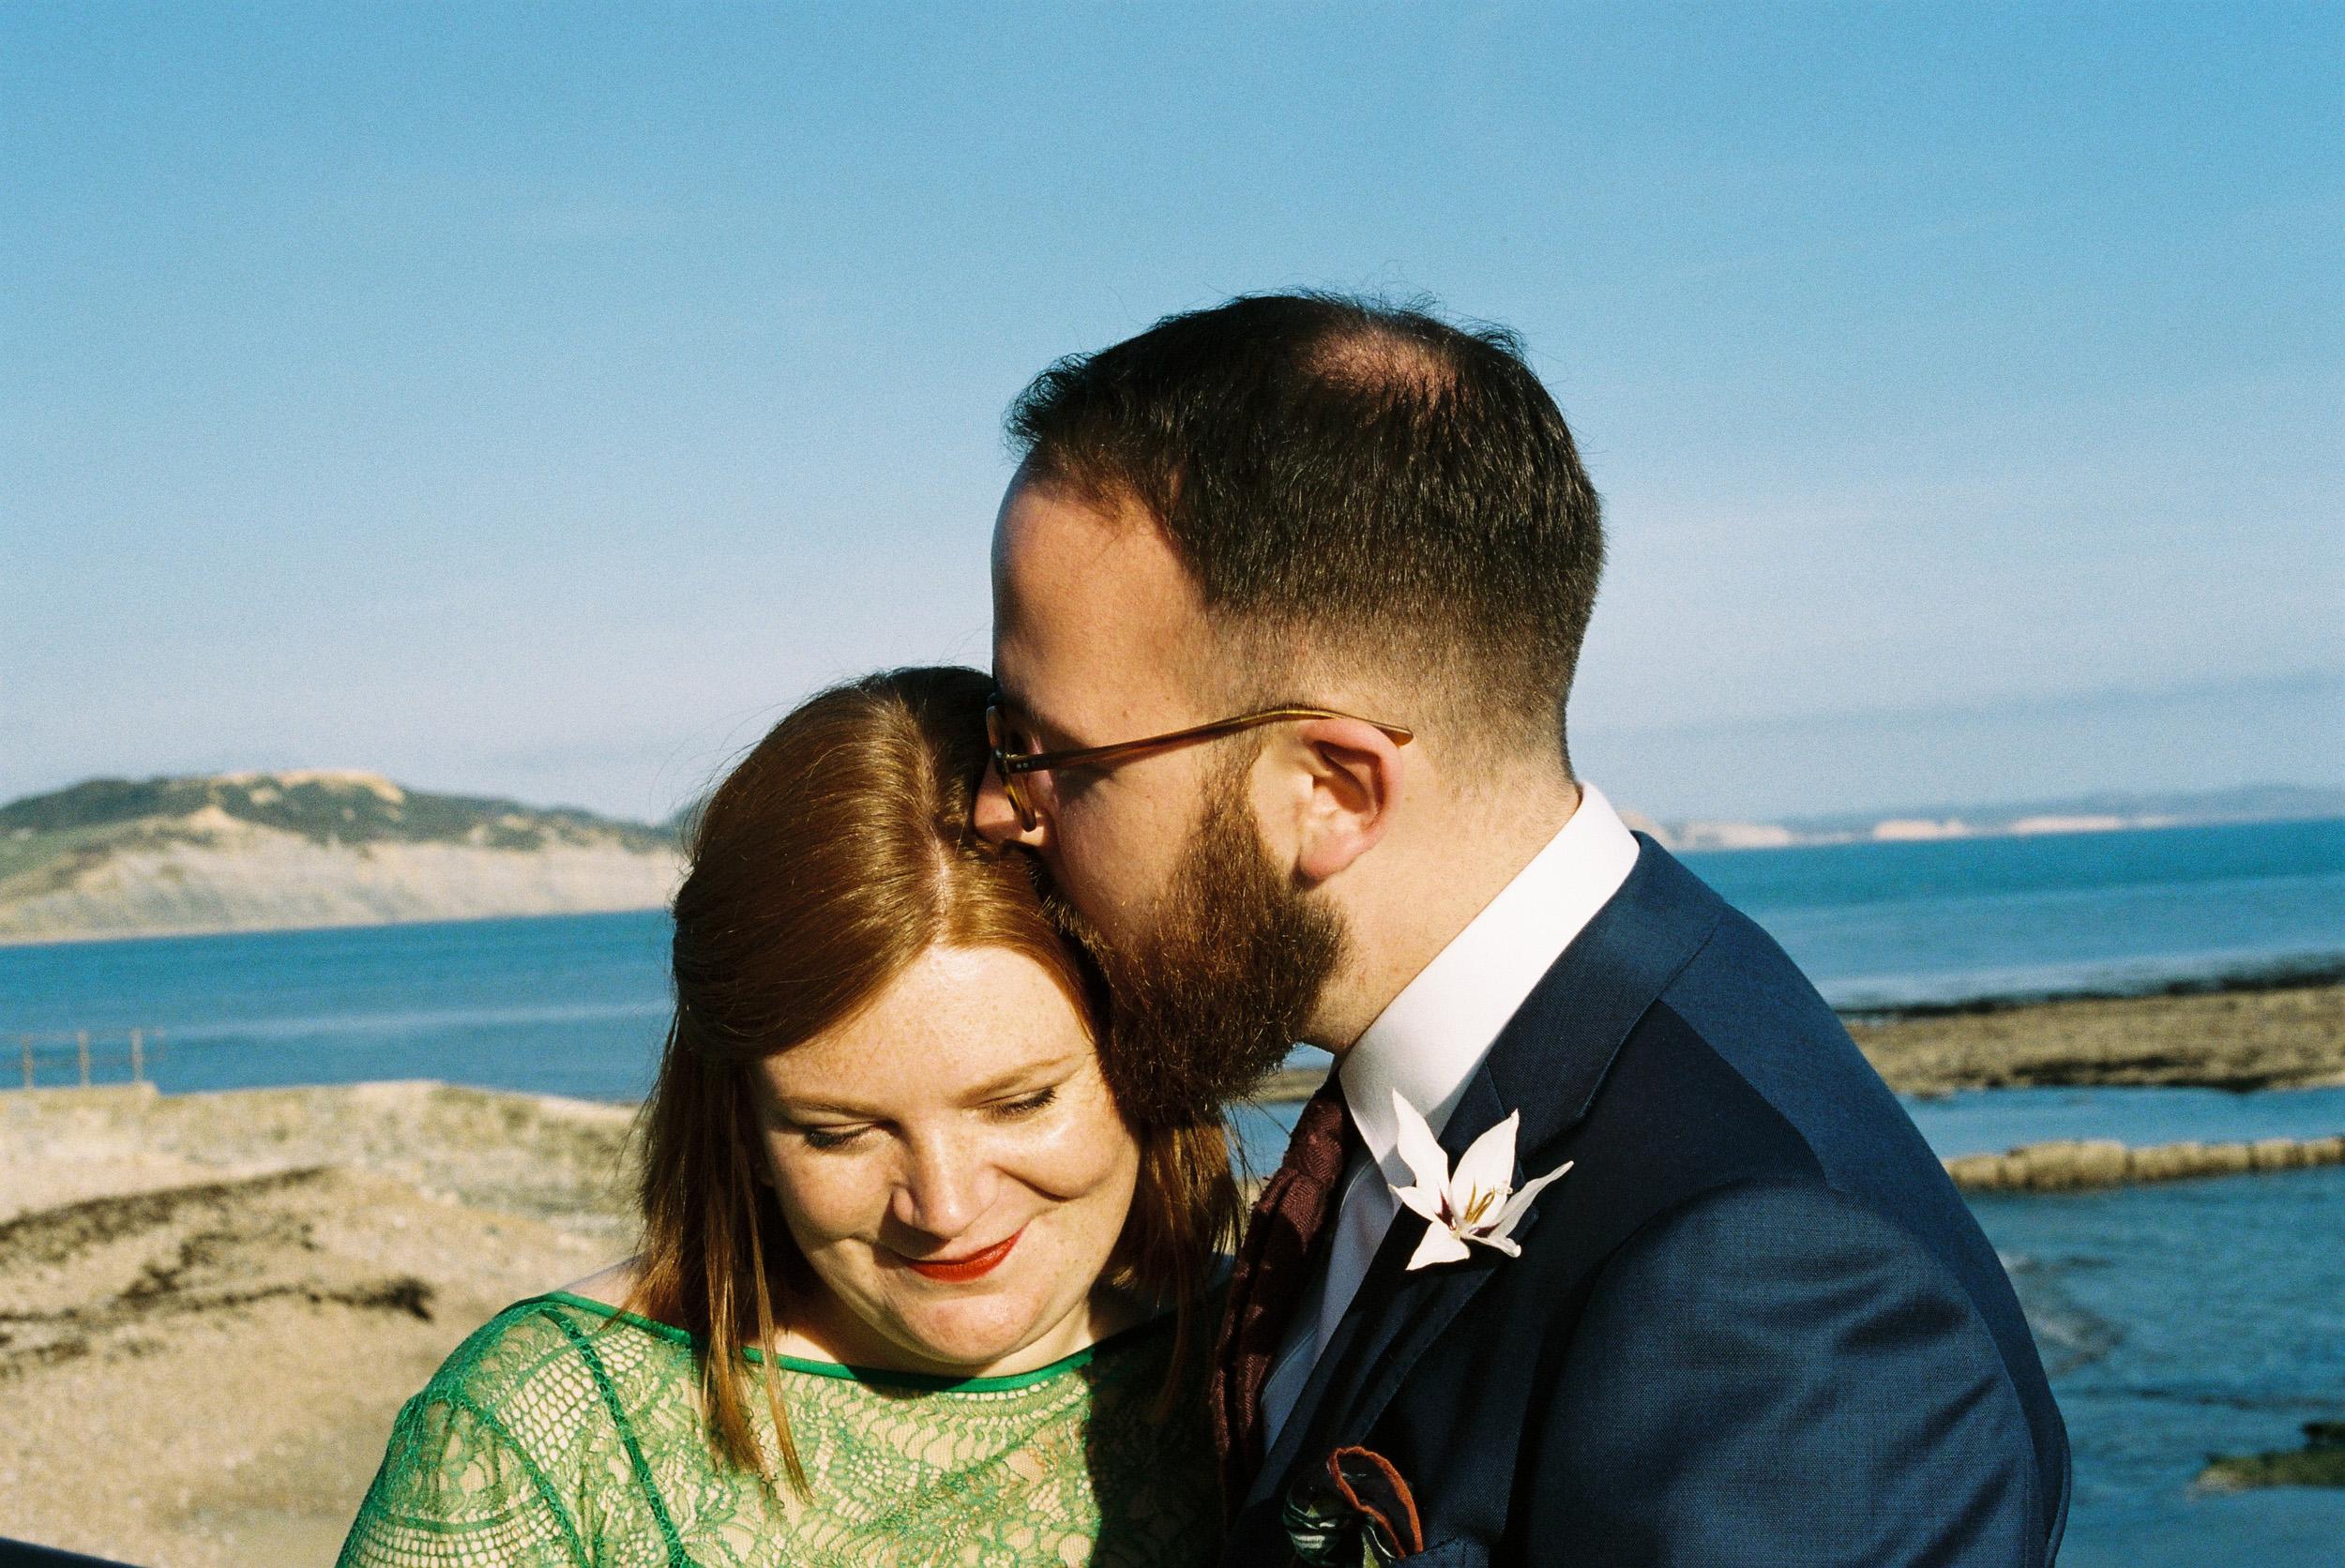 Lucy-Bespoke-Green-Silk-Lace-Wedding-Dress-Kate-Beaumont-Sheffield-8.jpg